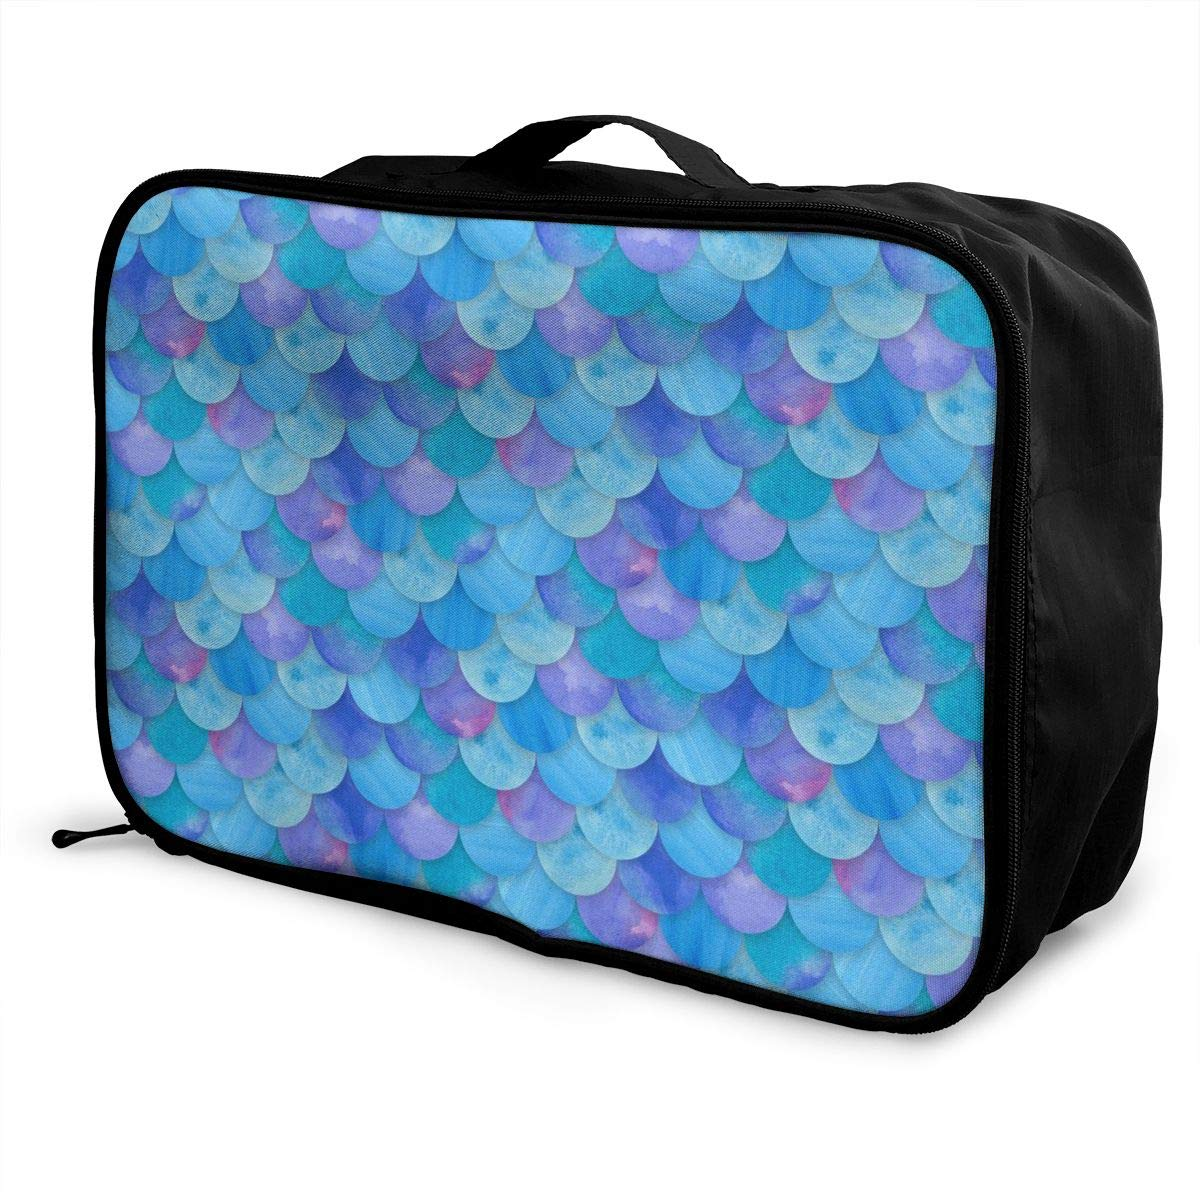 Sea Blue Mermaid Fish Scale Travel Duffel Bag Casual Large Capacity Portable Luggage Bag Suitcase Storage Bag Luggage Packing Tote Bag Weekend Trip